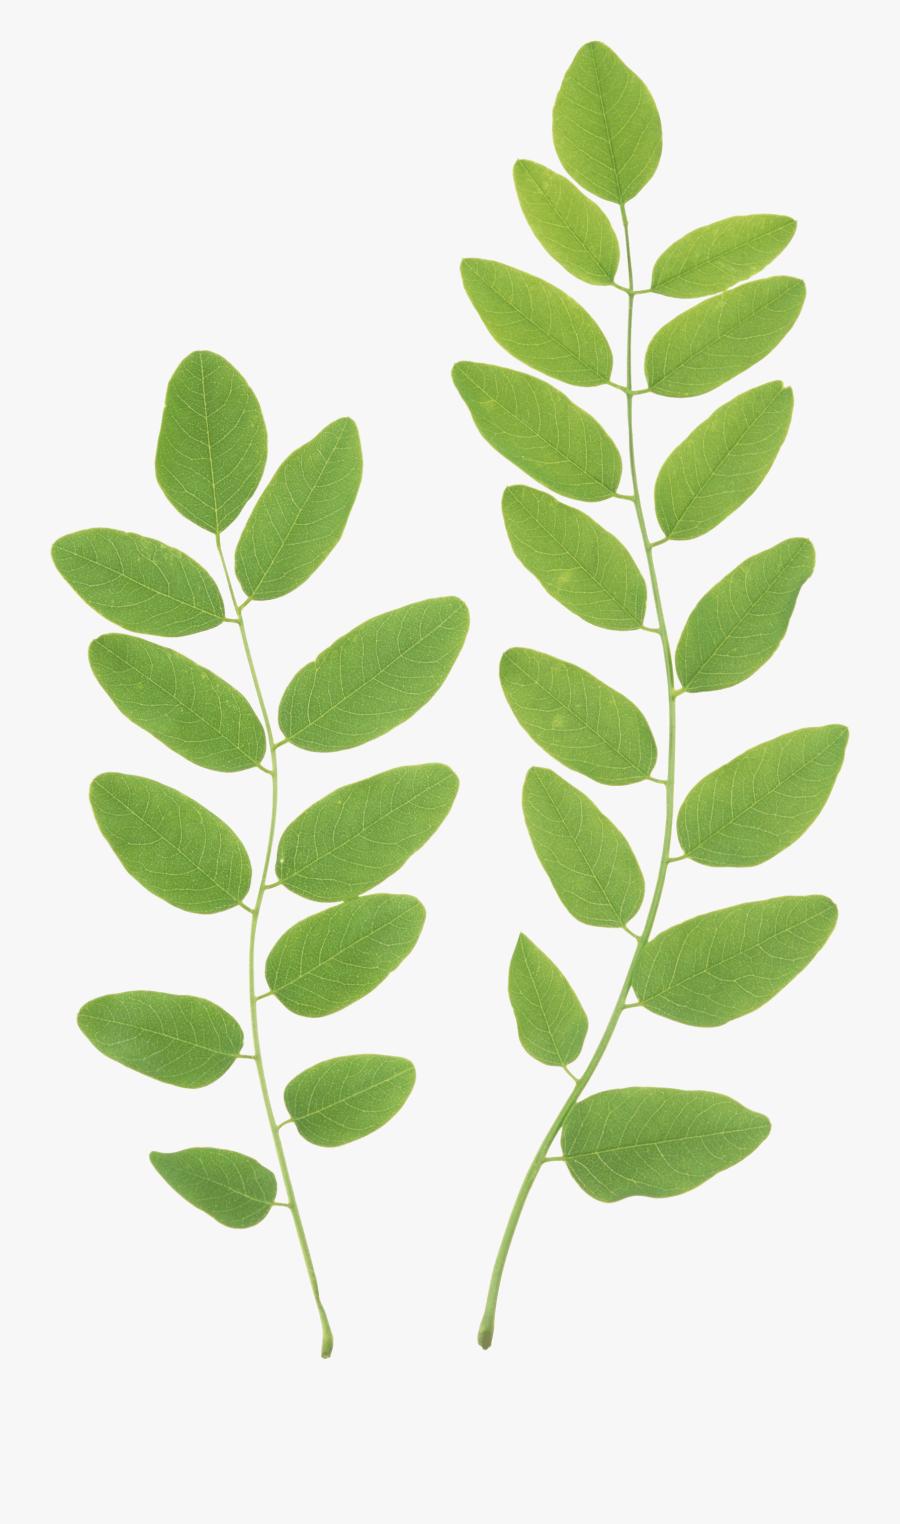 Collection Of Transparent - Green Leaf Transparent Background, Transparent Clipart